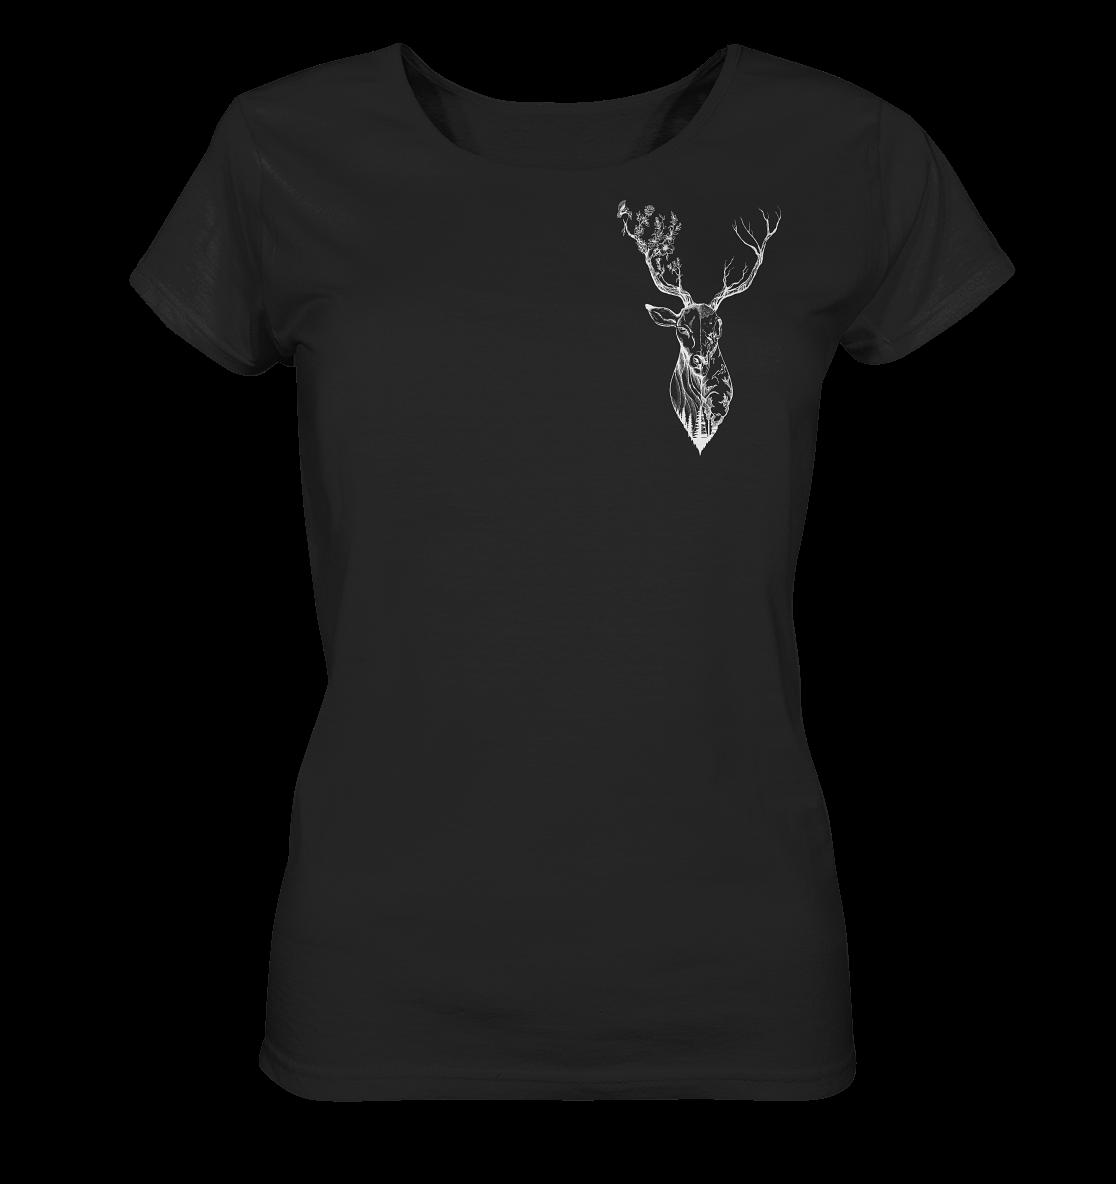 front-ladies-organic-shirt-272727-1116x-6.png